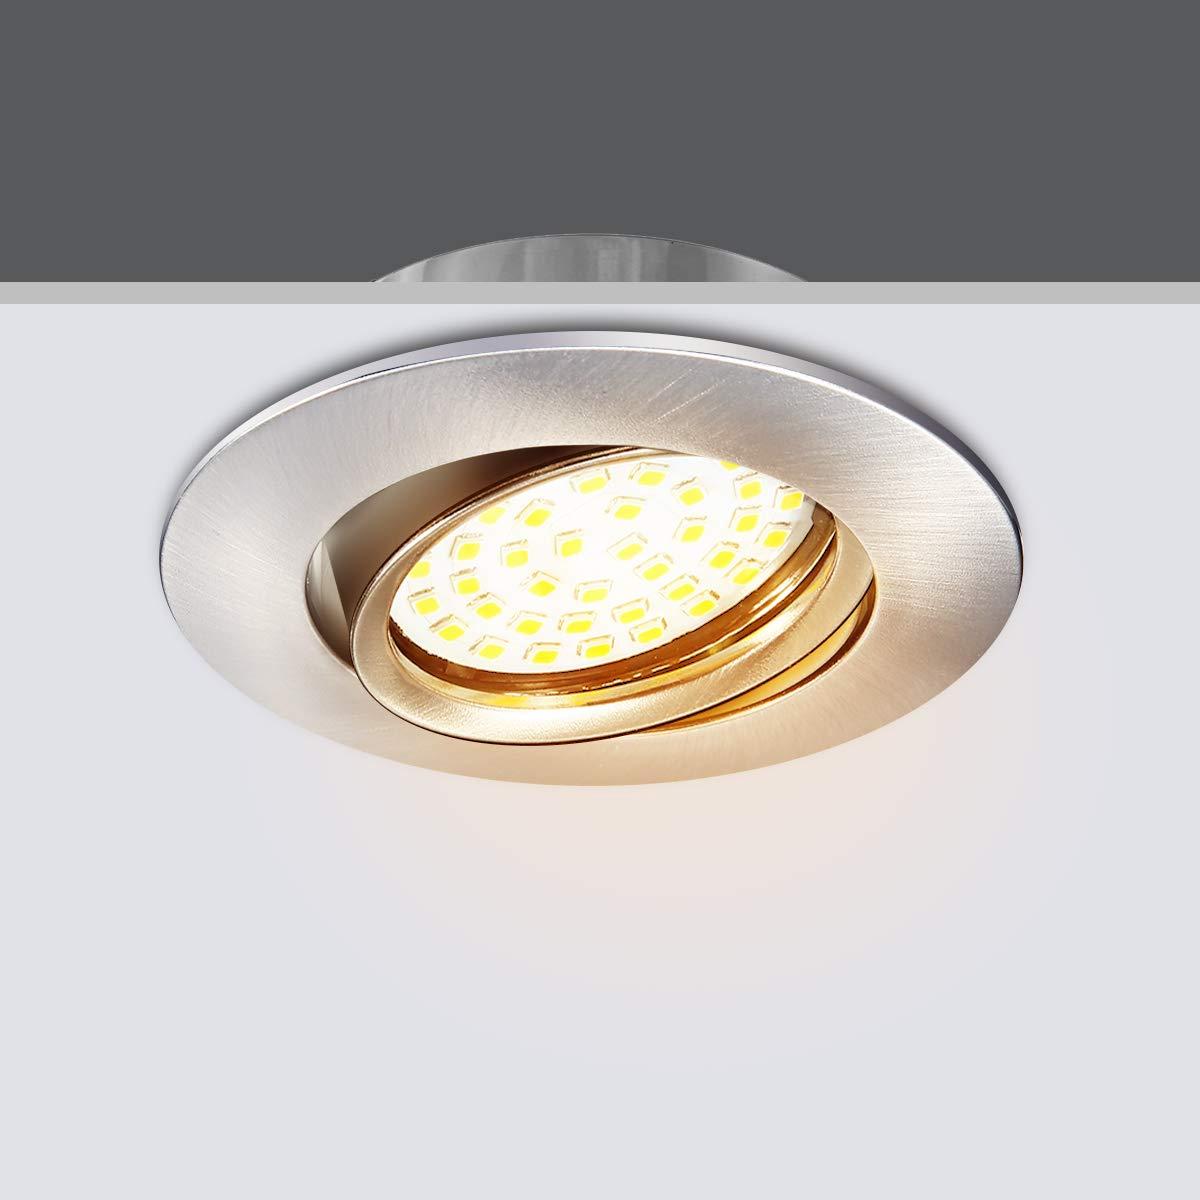 Elfeland LED Einbaustrahler Schwenkbar 6x 5W 48 LED Modul Deckeneinbaustrahler Deckenspot Einbauspot Deckeneinbauleuchte Spot Einbauleuchte Einbaustrahler 450lm 3000K Warmwei/ß IP44 LED Deckenstrahler